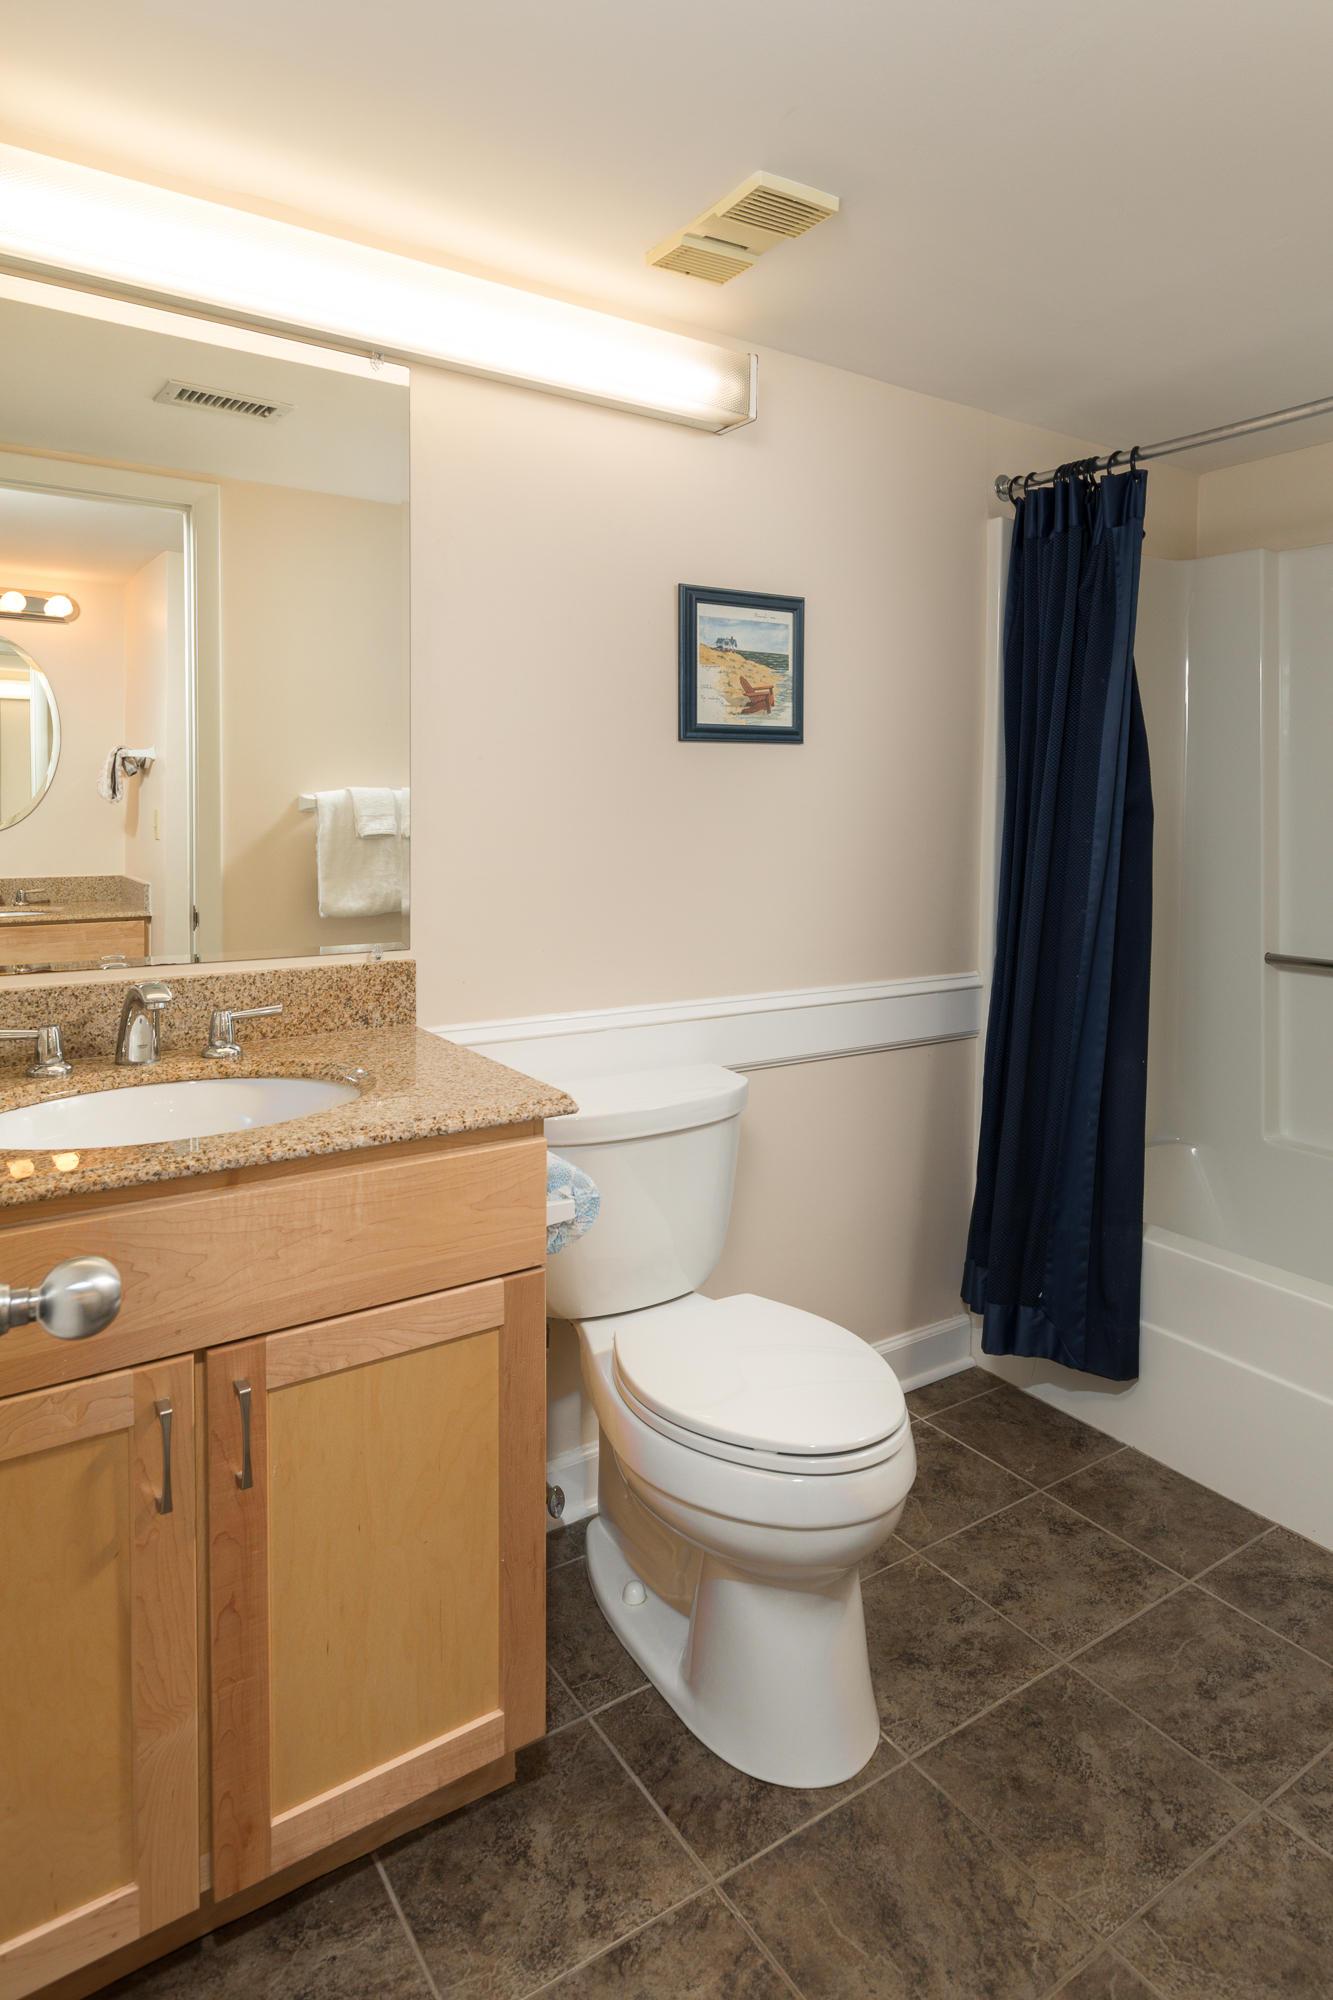 Seabrook Island Homes For Sale - 2909 Atrium Villa, Seabrook Island, SC - 53